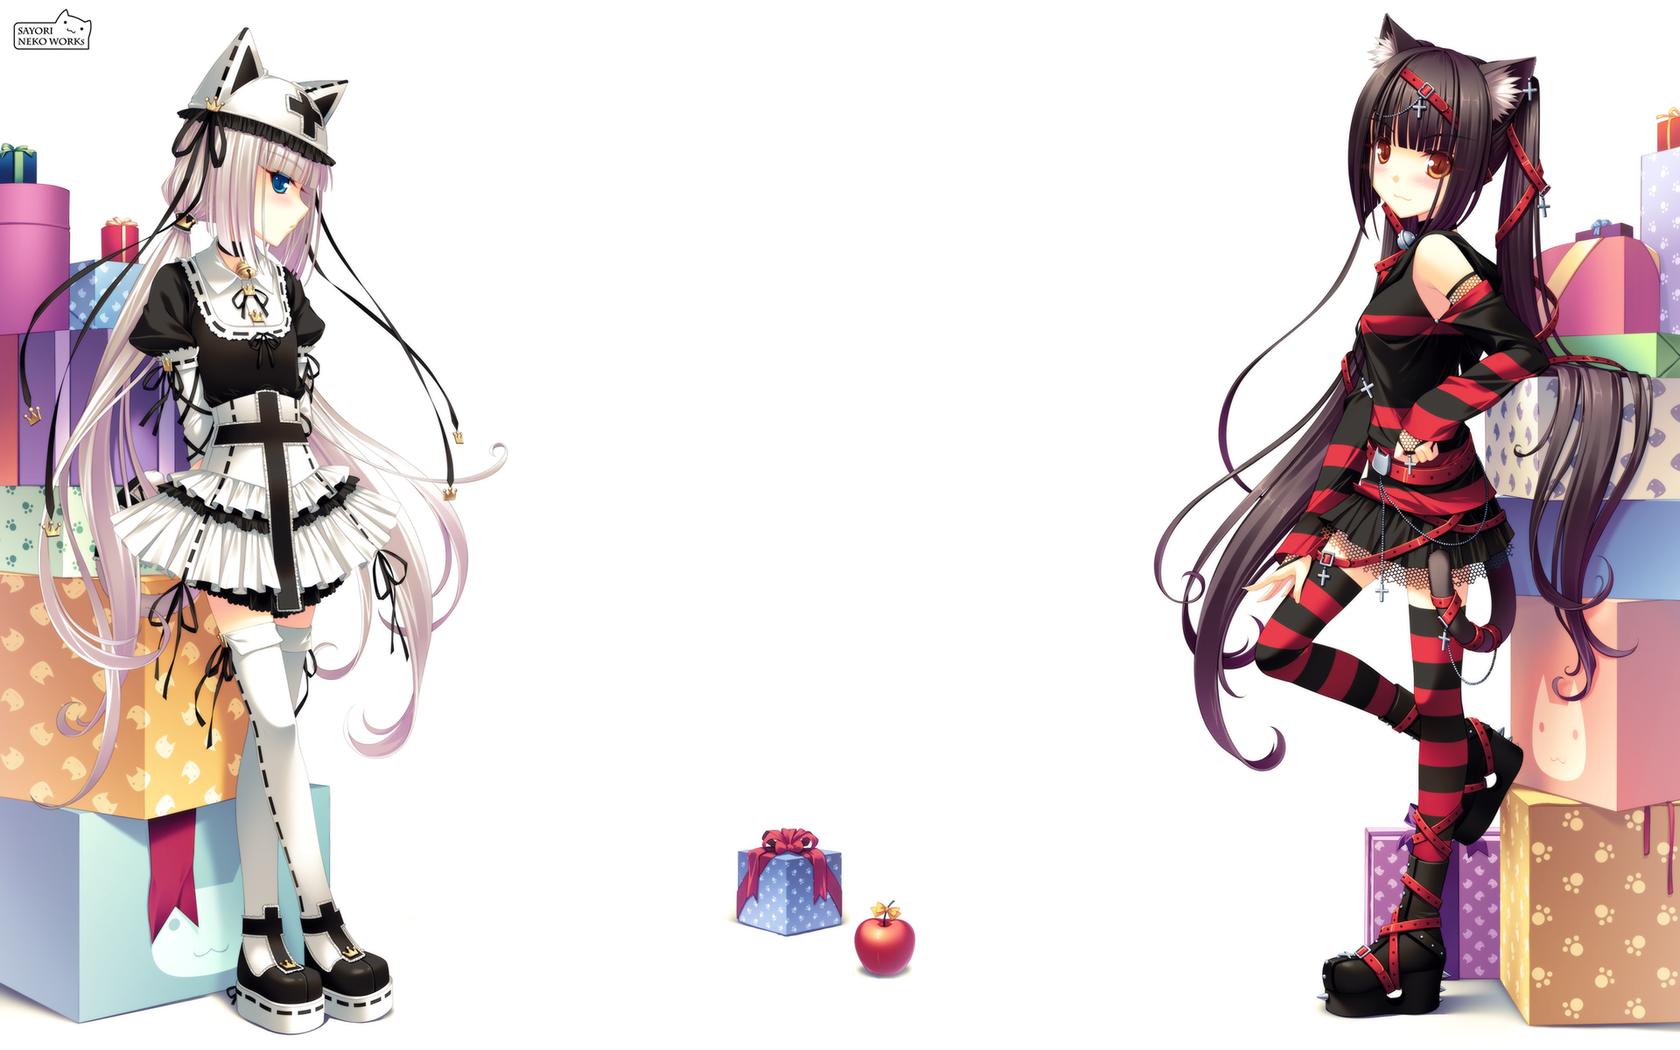 Neko Girl Wallpaper Pack 2 1680x1050